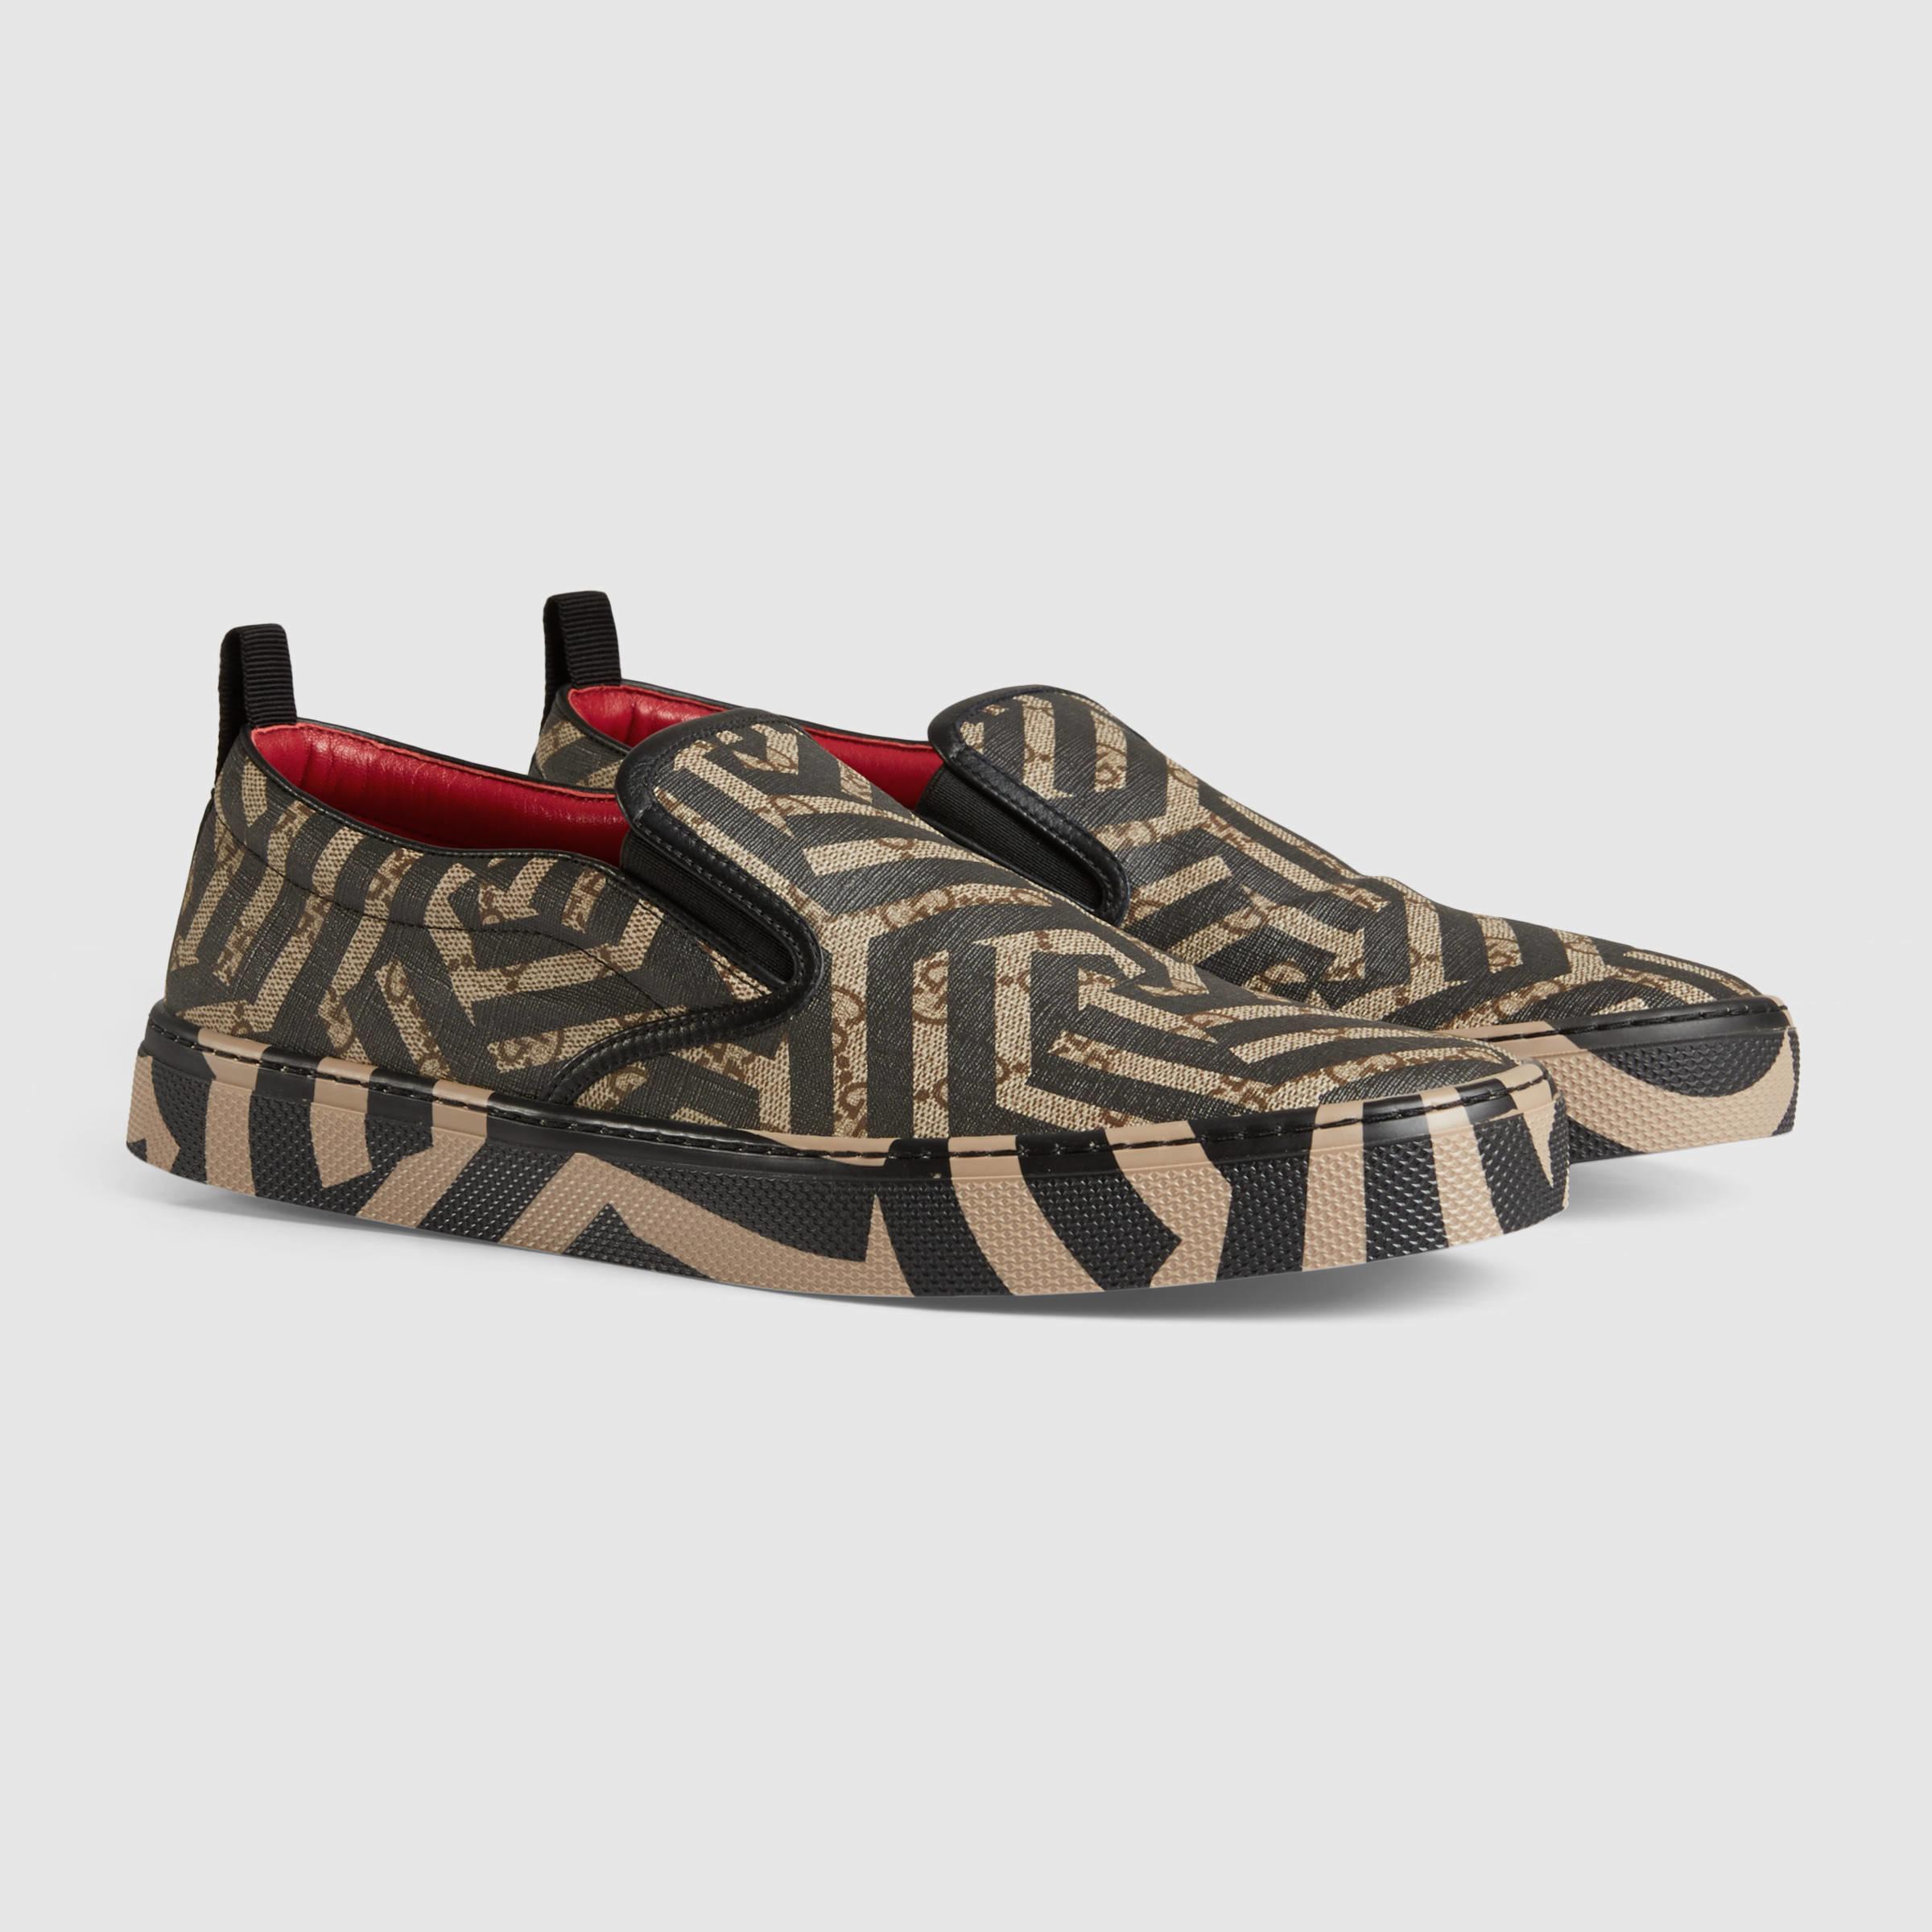 0bdcf3ddd Gucci Gg Caleido Sneaker for Men - Lyst